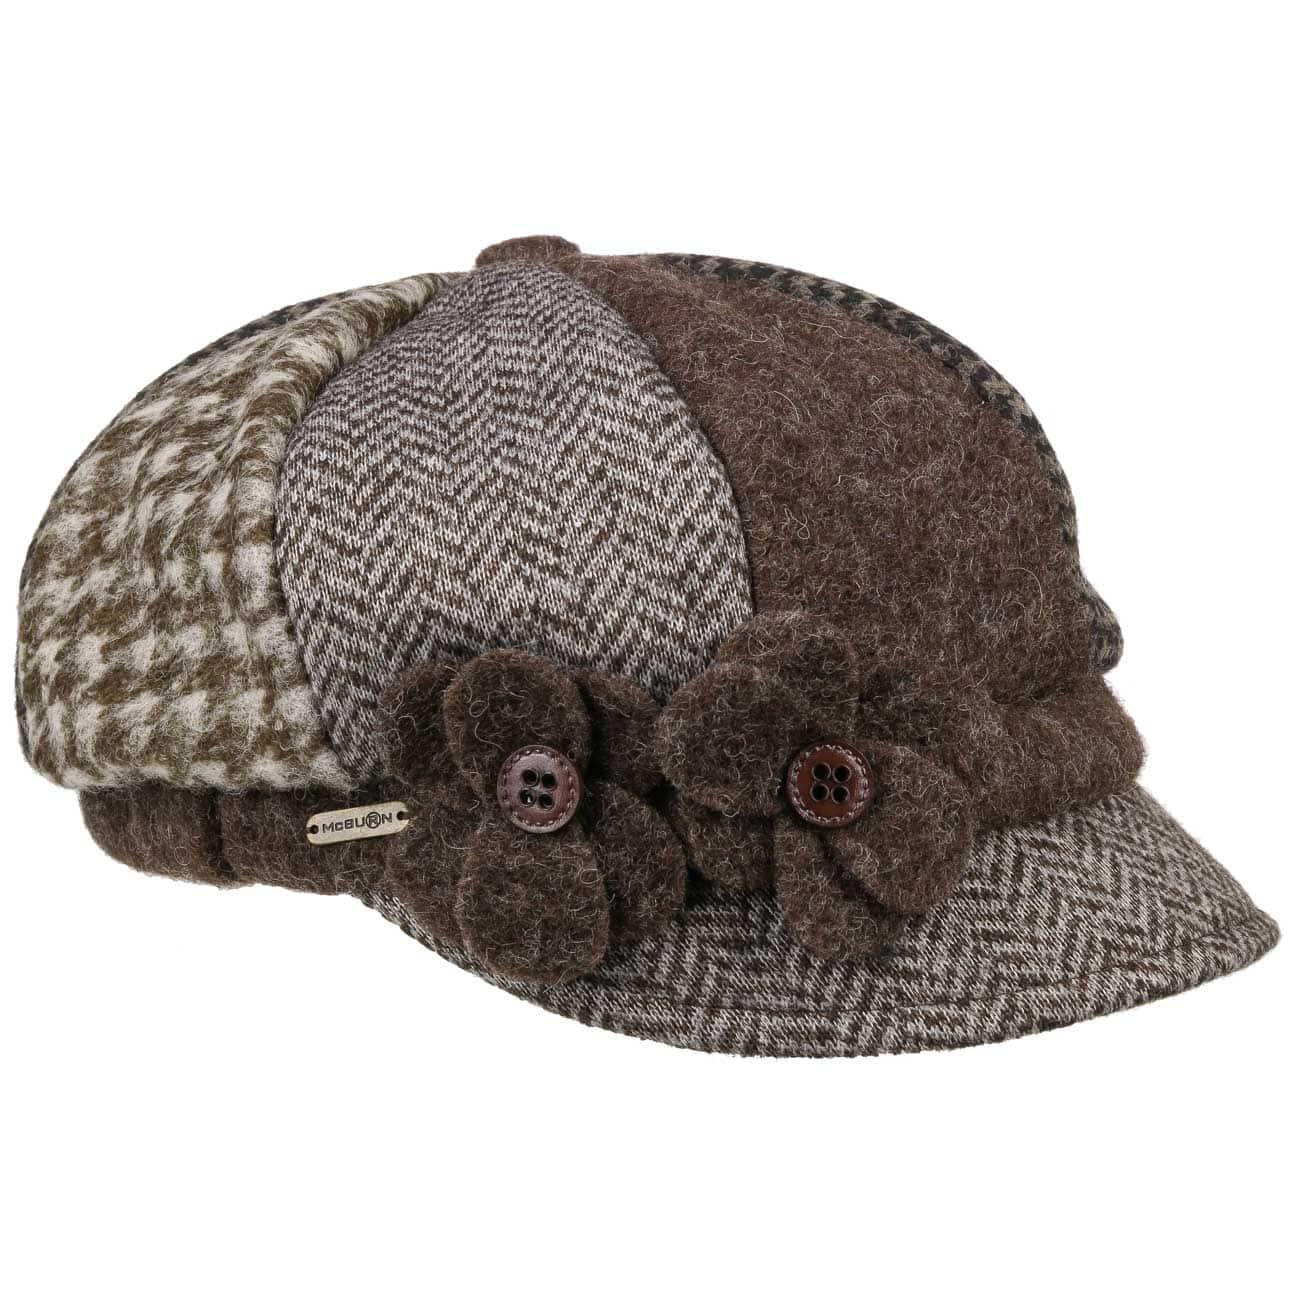 Gorra de Mujer Tri-Patterned by McBURN  gorra de mujer